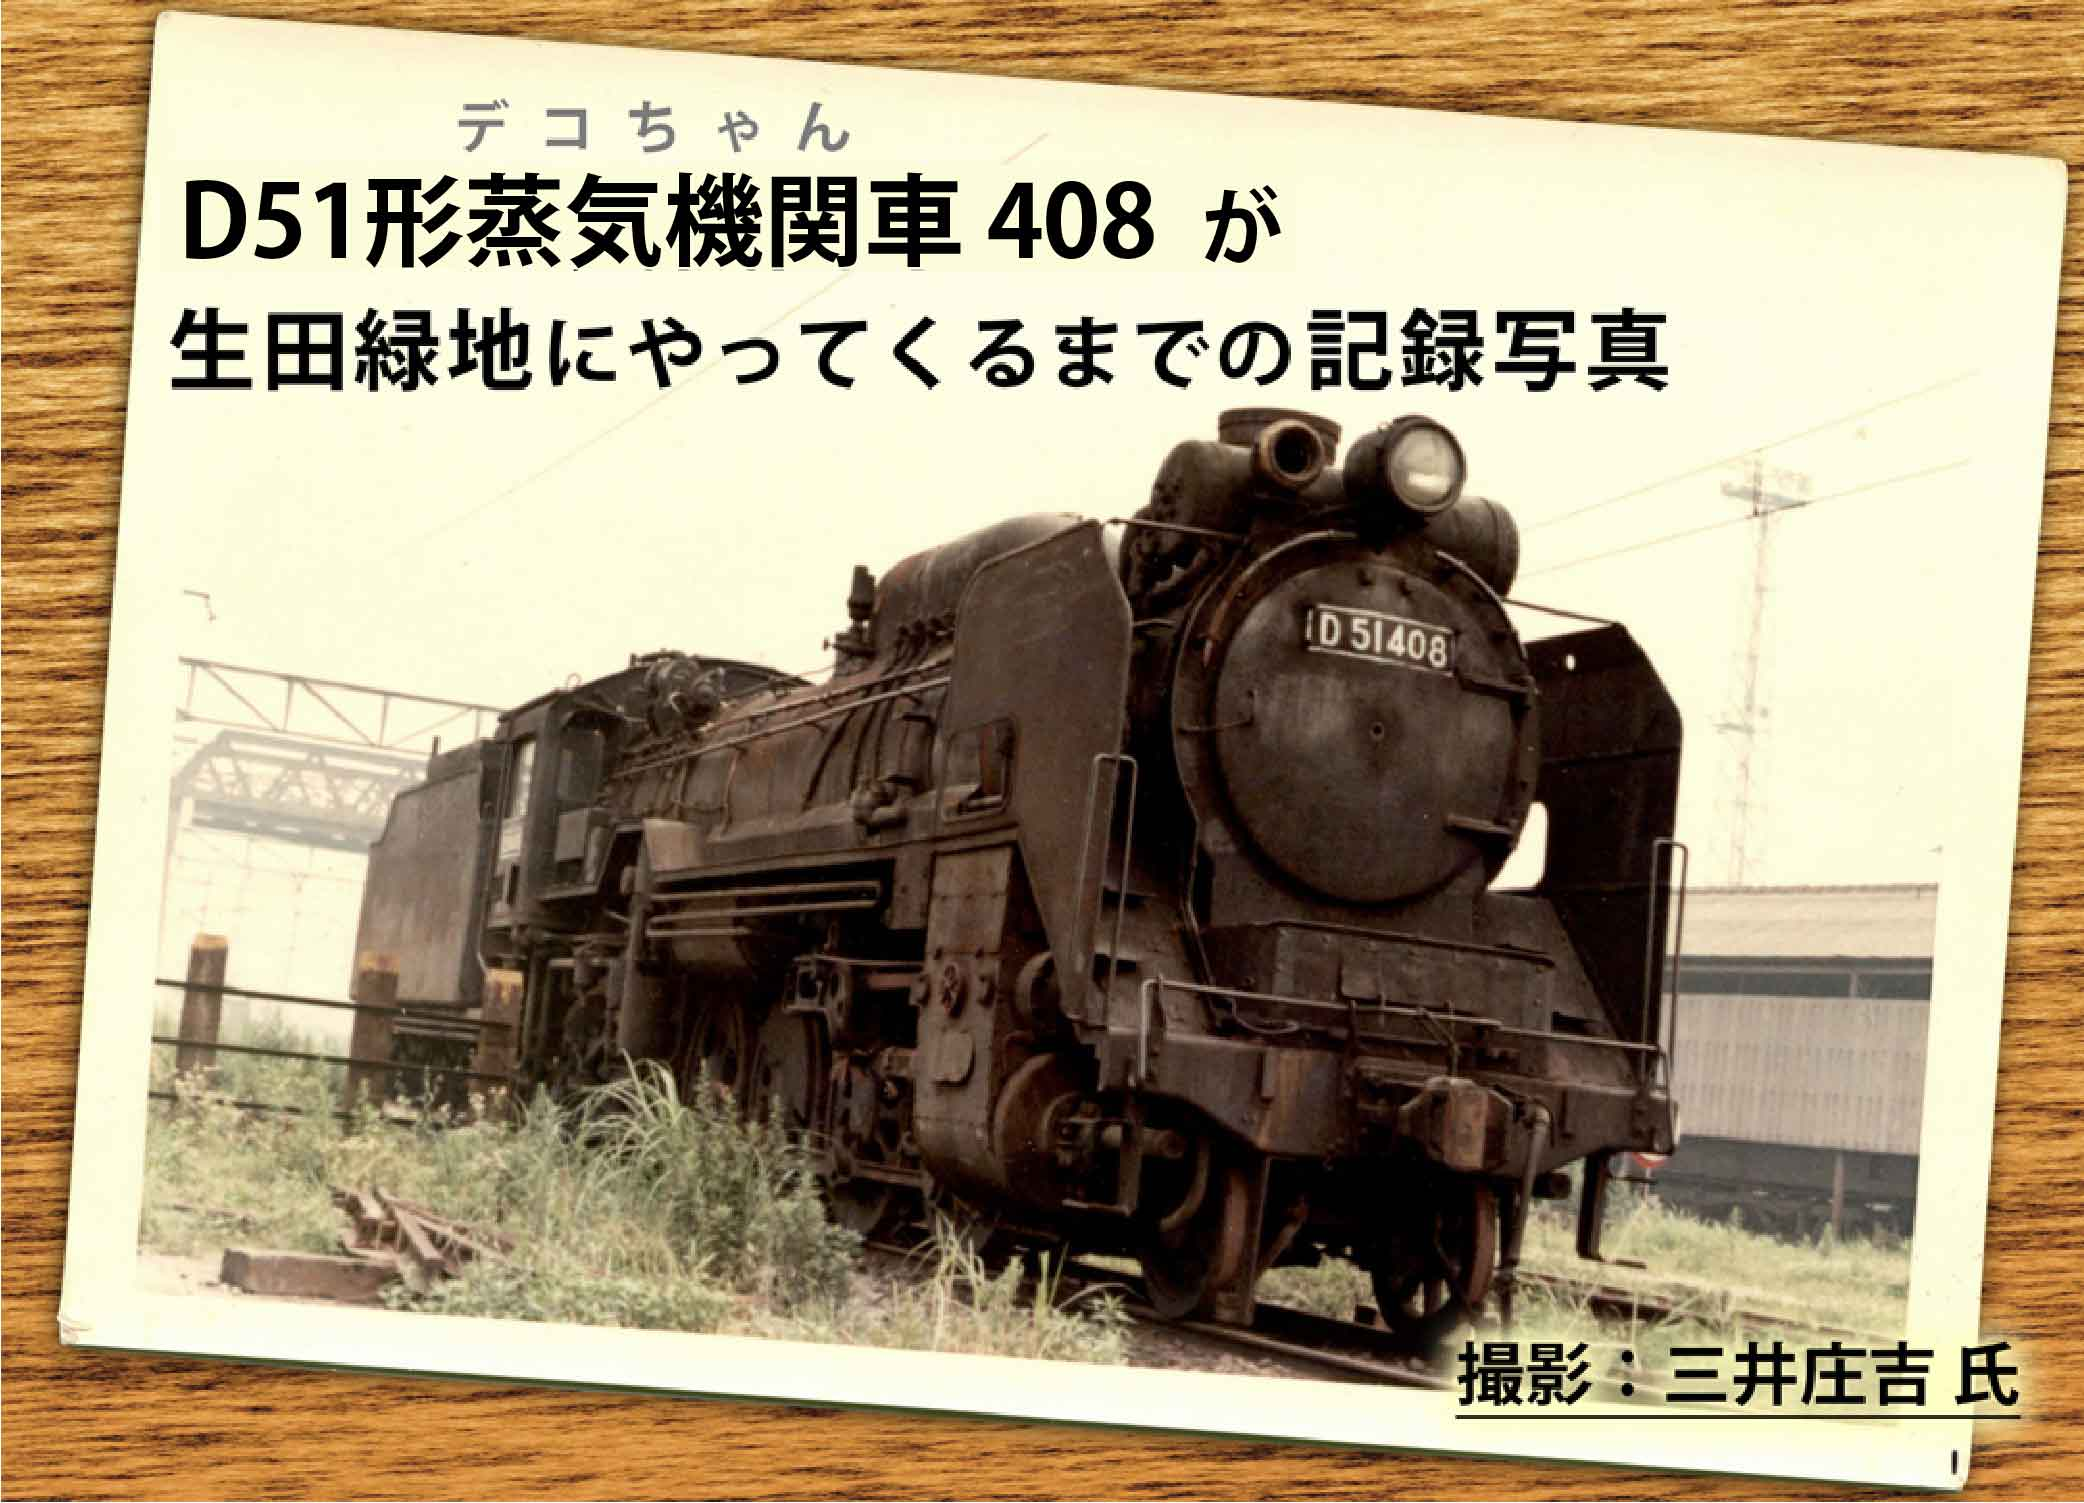 D51型蒸気機関車408が生田緑地にやってくるまでの記録写真 撮影:三井庄吉氏